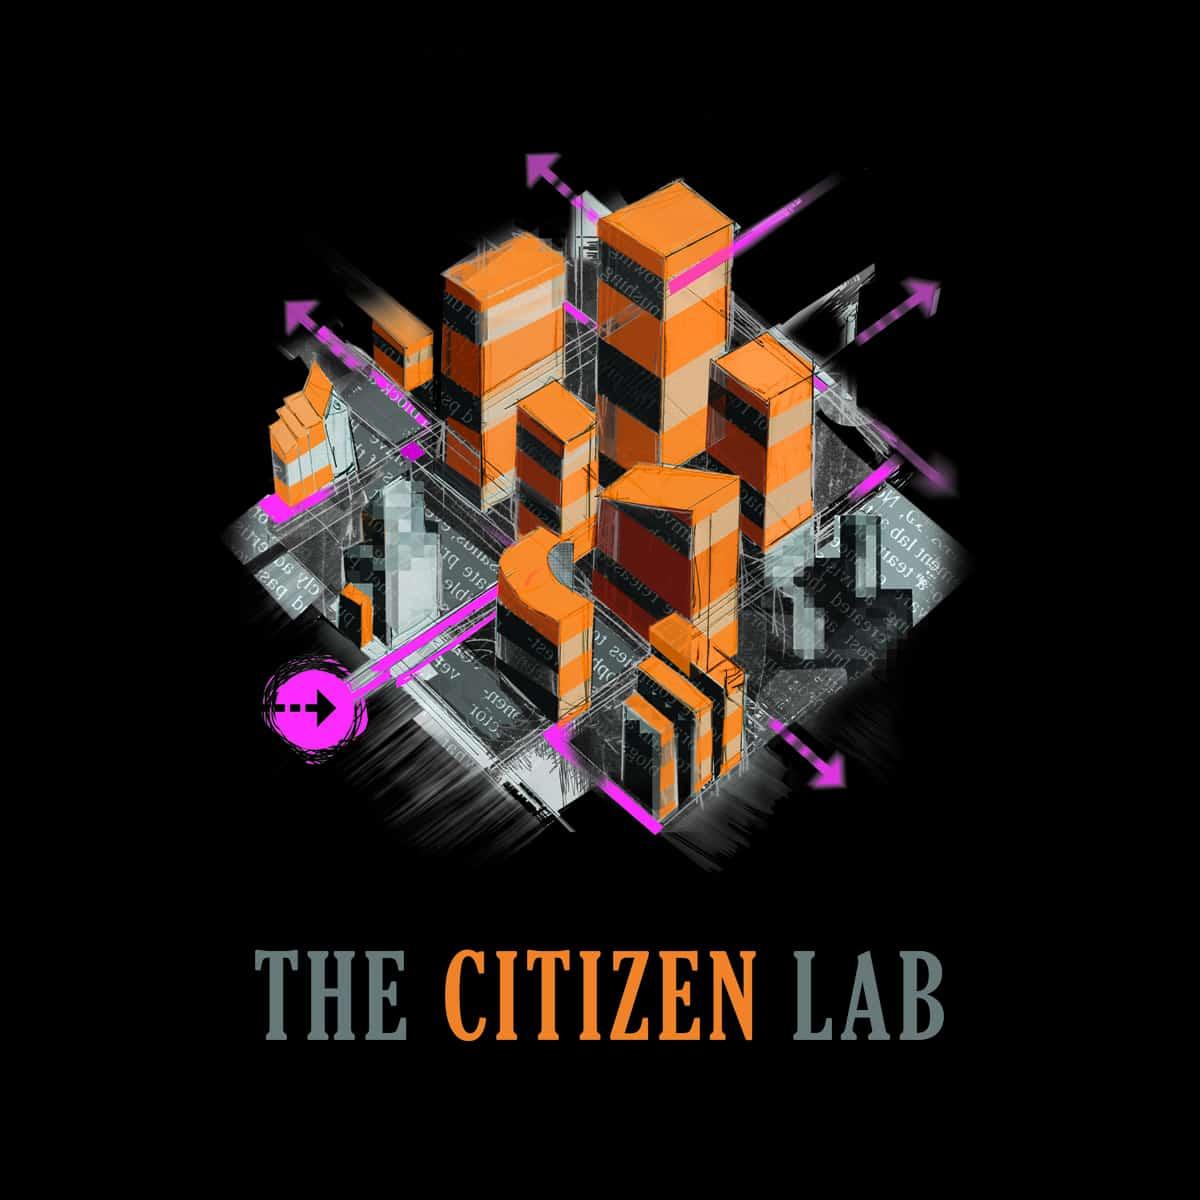 citlab-cities